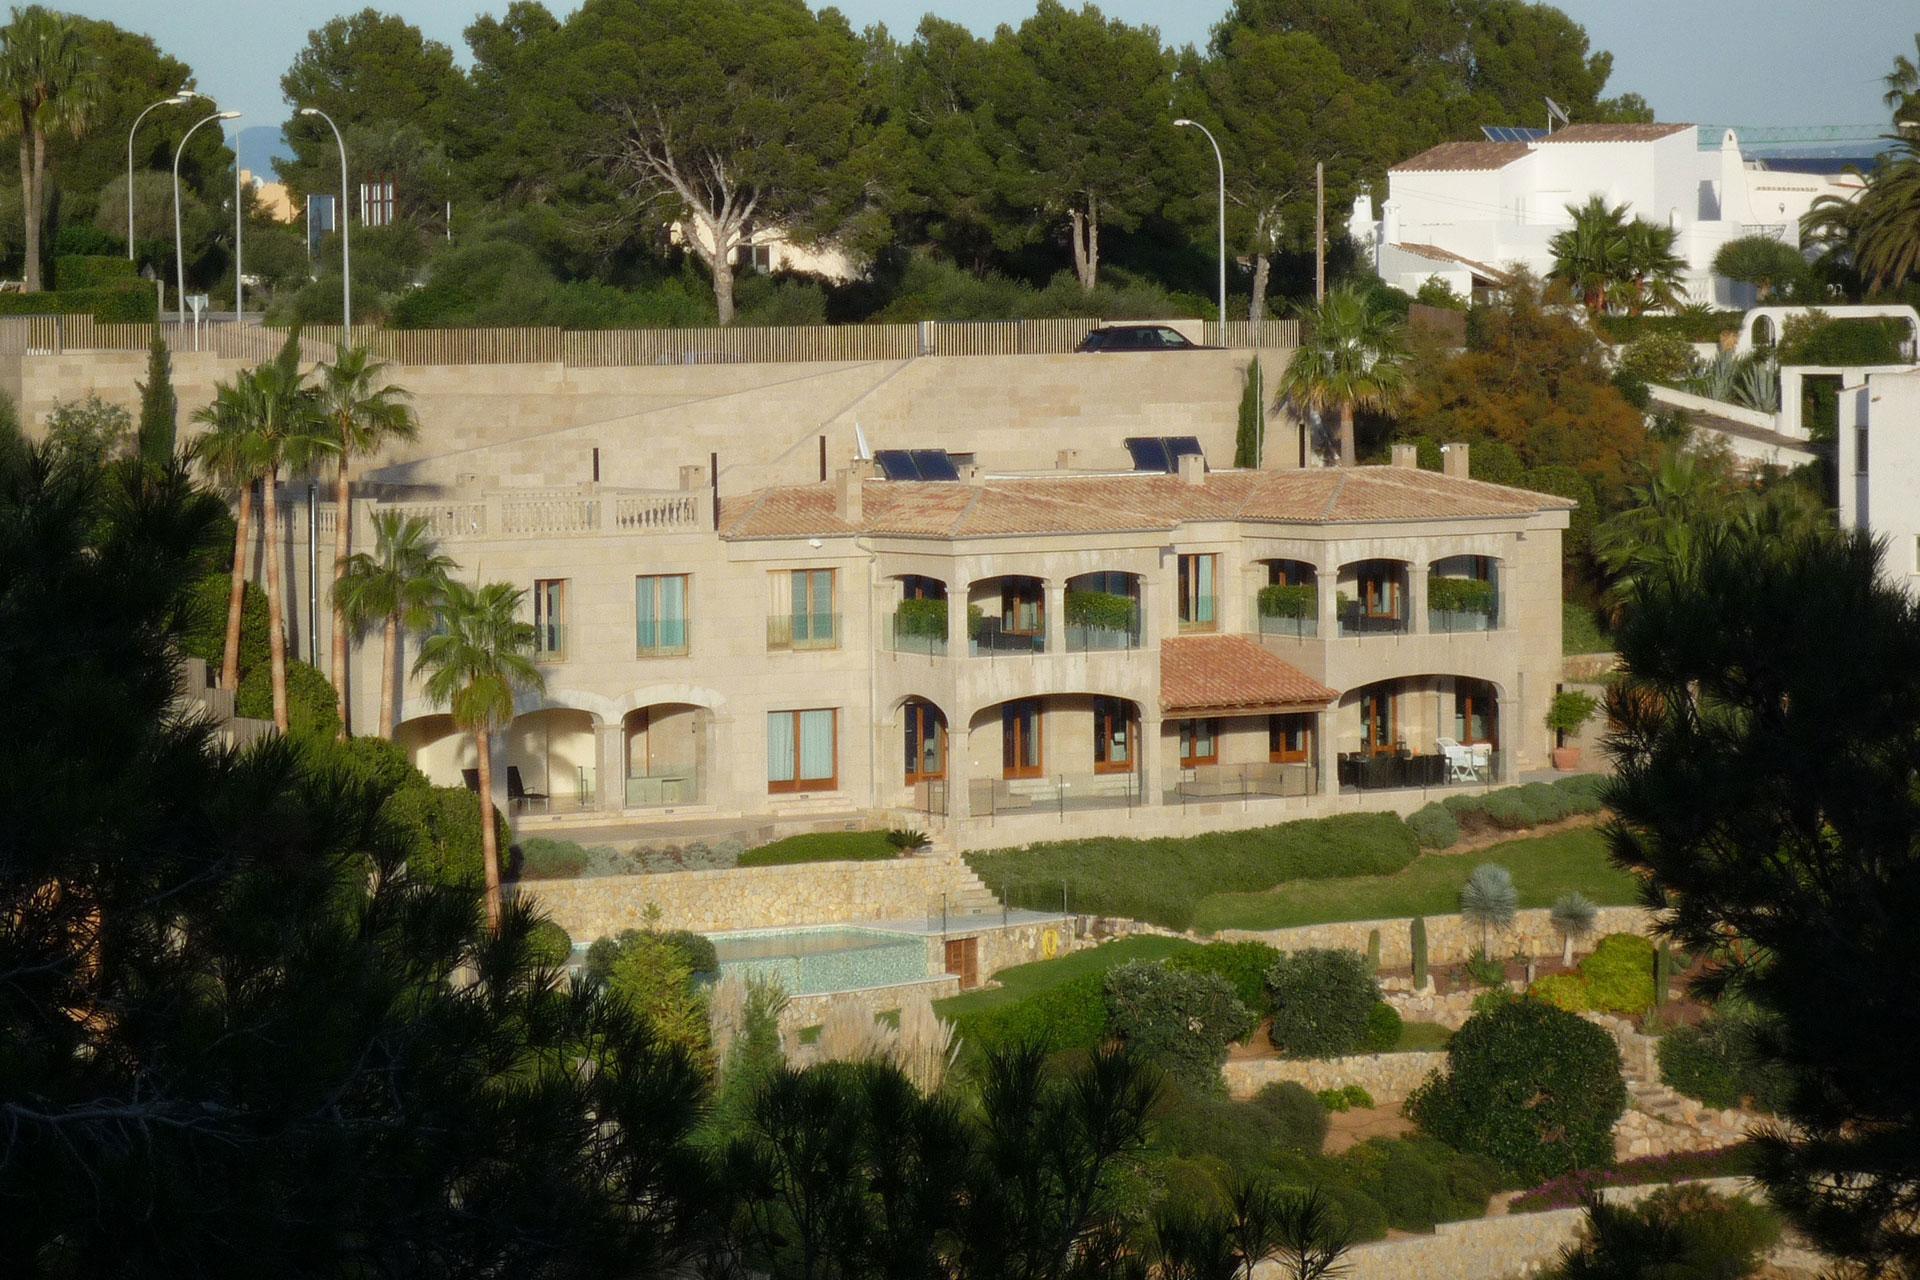 Proyectos Plurifamiliar, Sol Mallorca | CBR